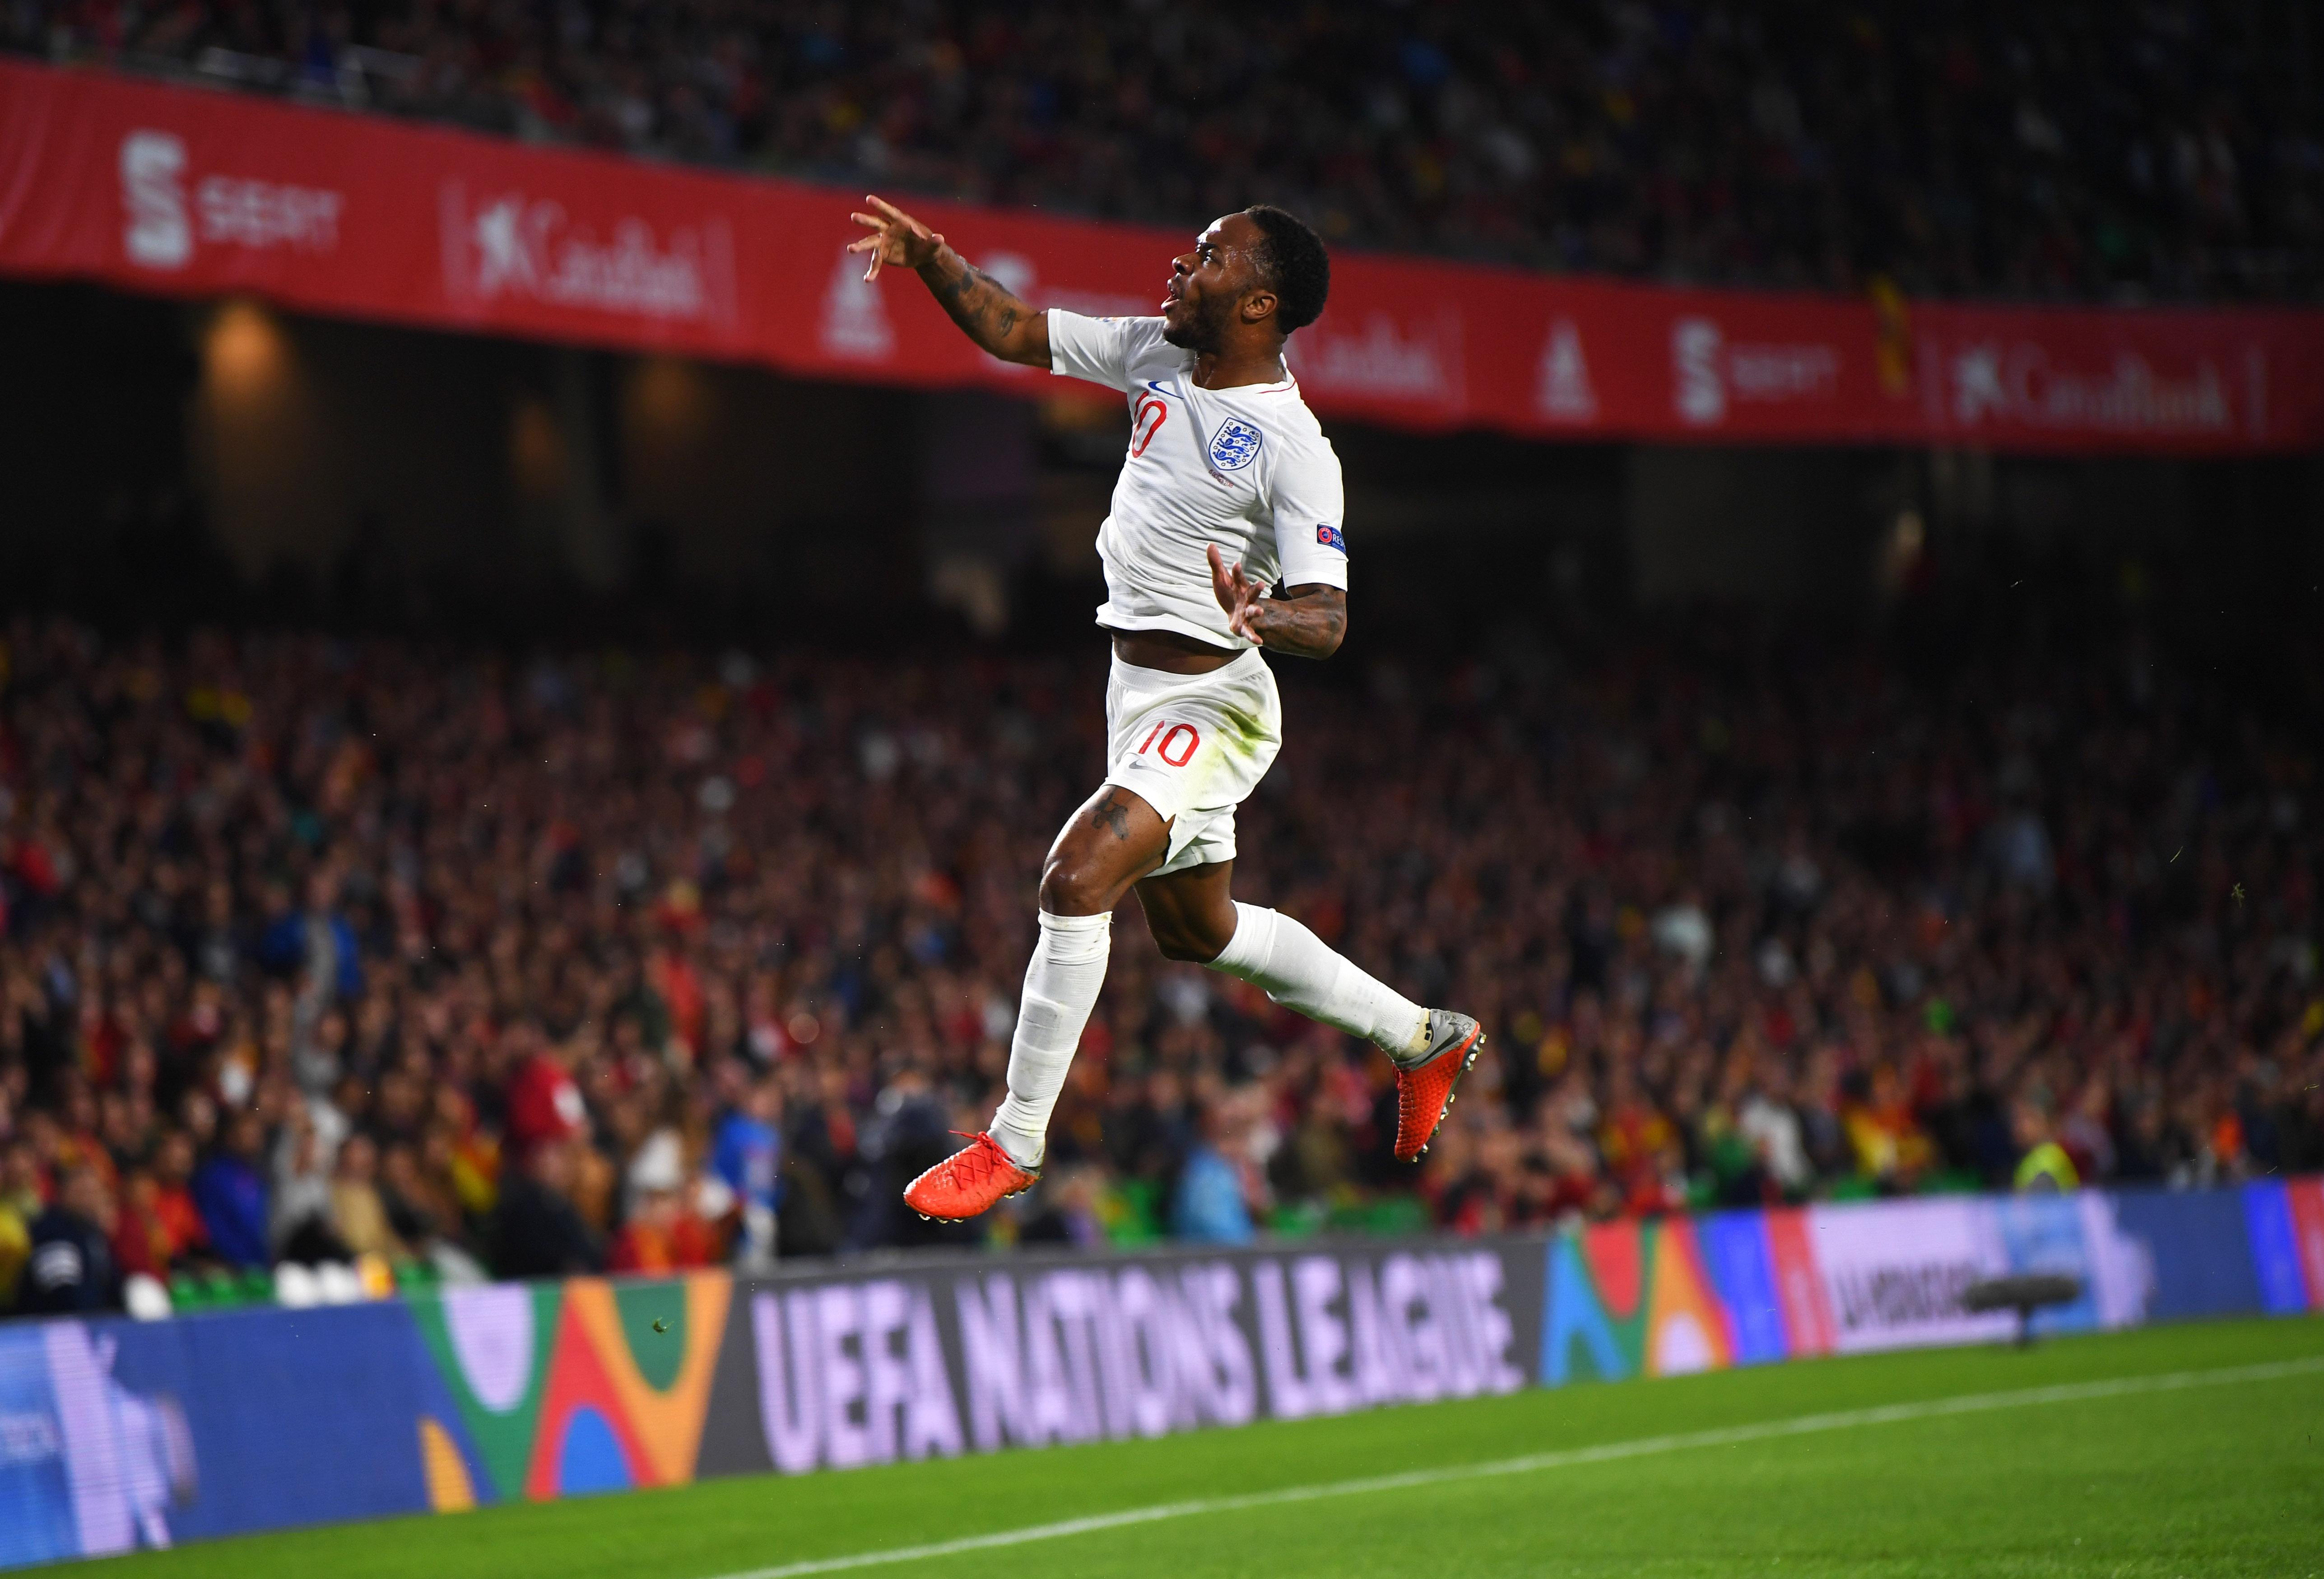 STERLING ESPAÑA INGLATERRA UEFA NATIONS LEAGUE